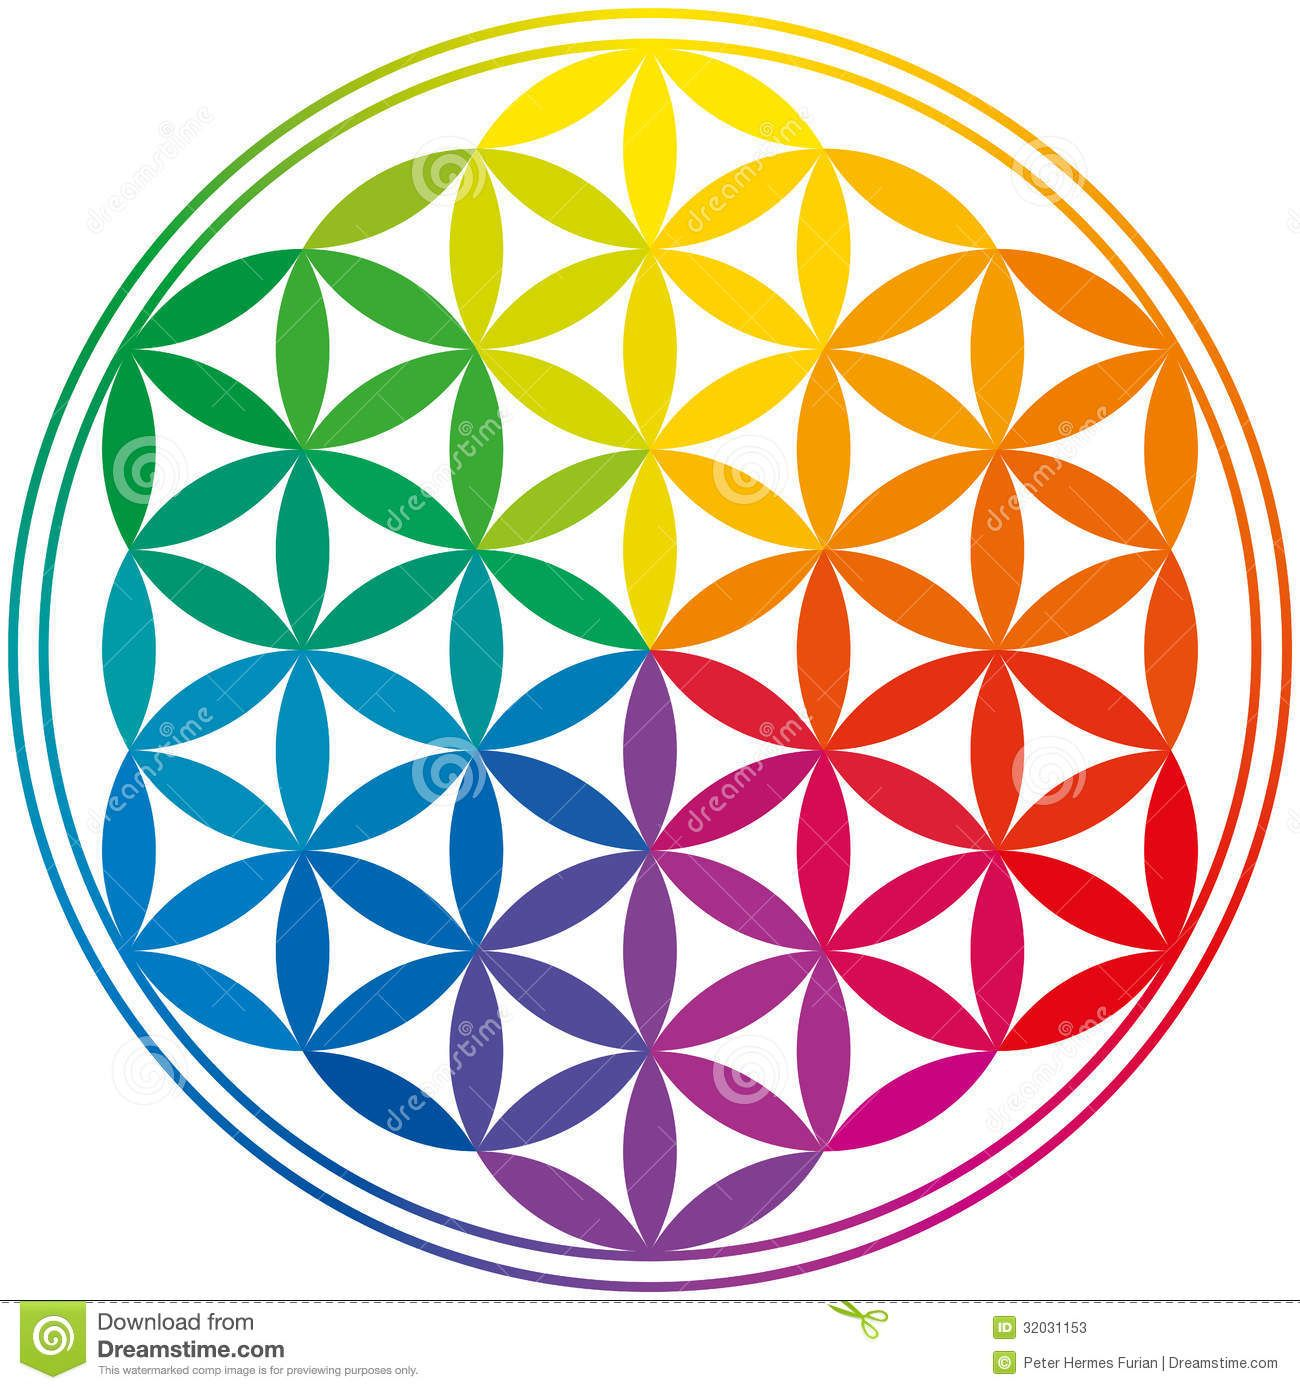 Flor De La Vida Google Search Flower Of Life Flower Mandala Sacred Geometry